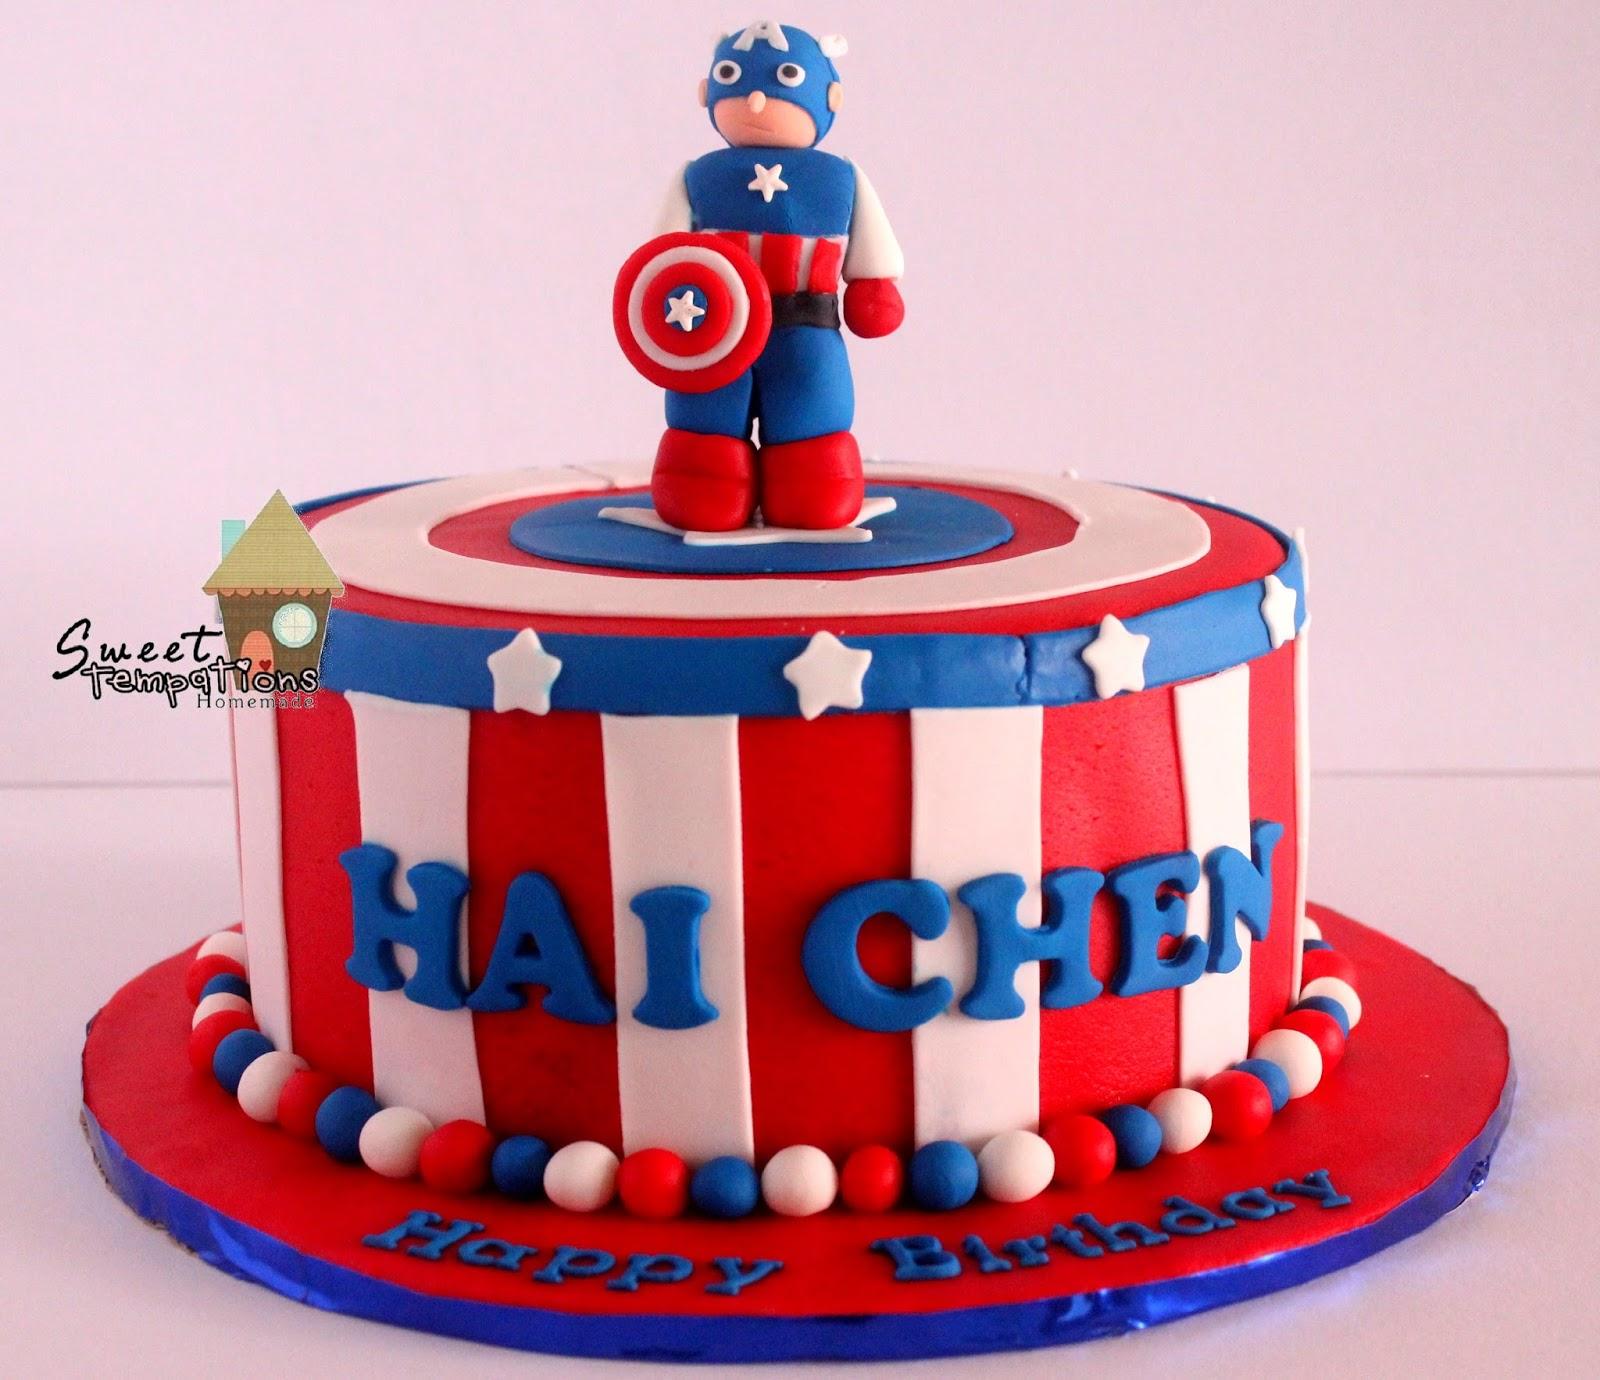 Sweet Temptations Homemade Cakes Pastry Avengers Captain America Cake